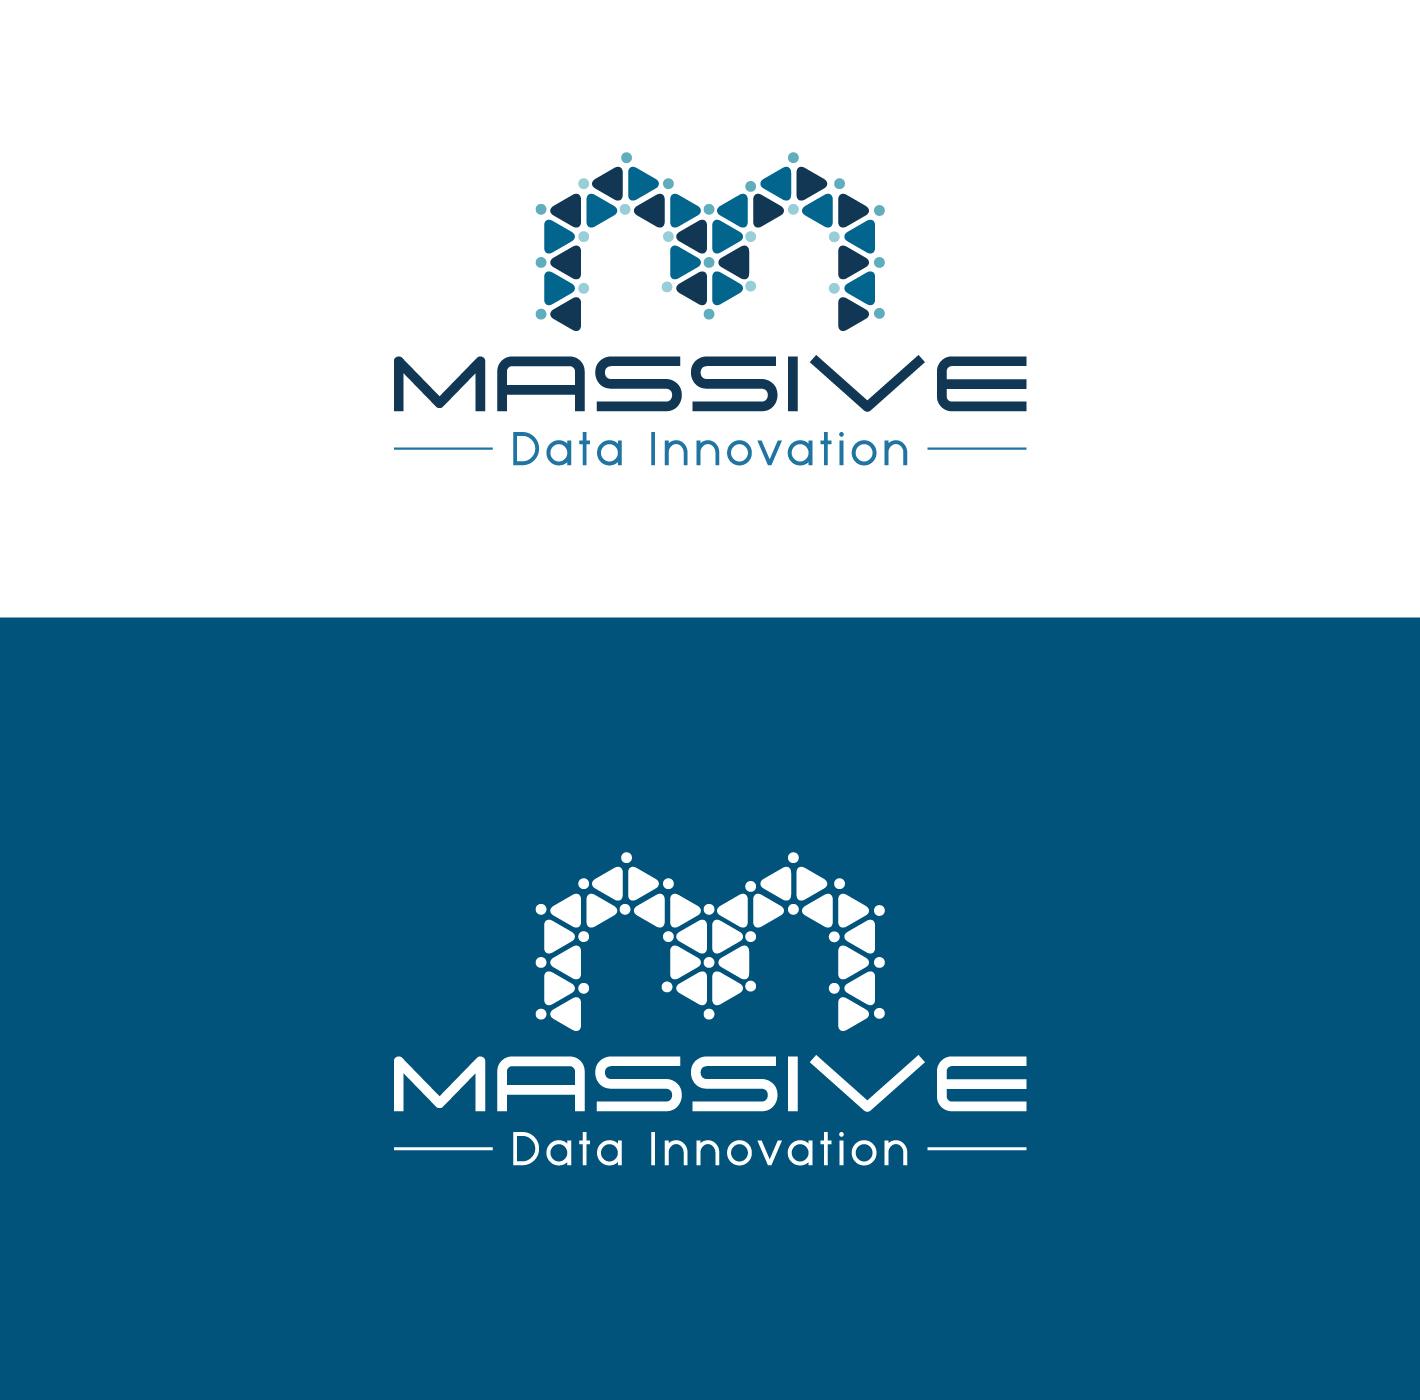 Logo Design by Sami Baig - Entry No. 504 in the Logo Design Contest MASSIVE LOGO.